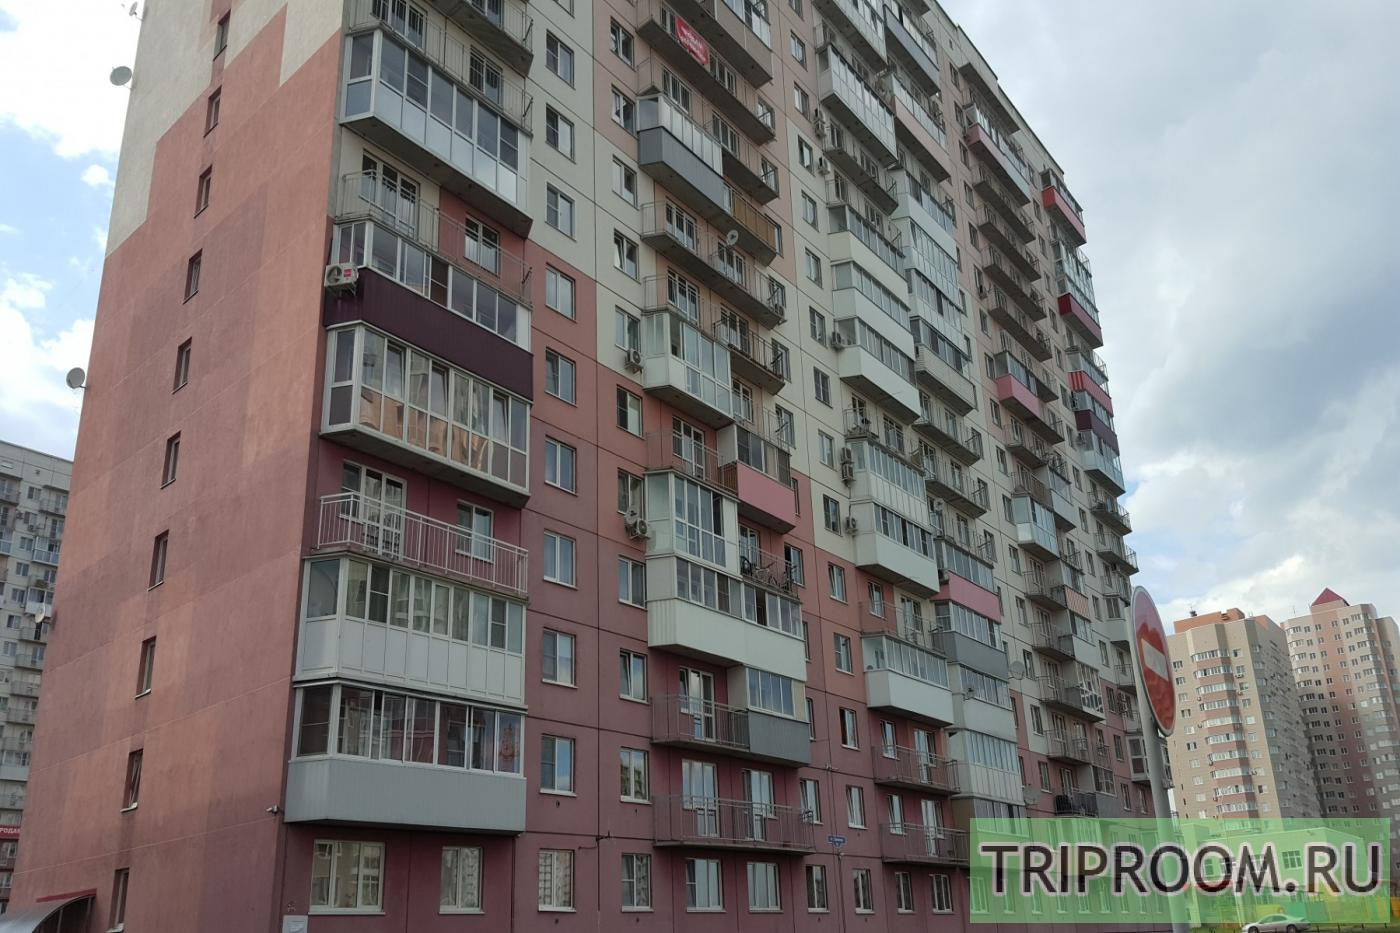 1-комнатная квартира посуточно (вариант № 30838), ул. Ермакова улица, фото № 8